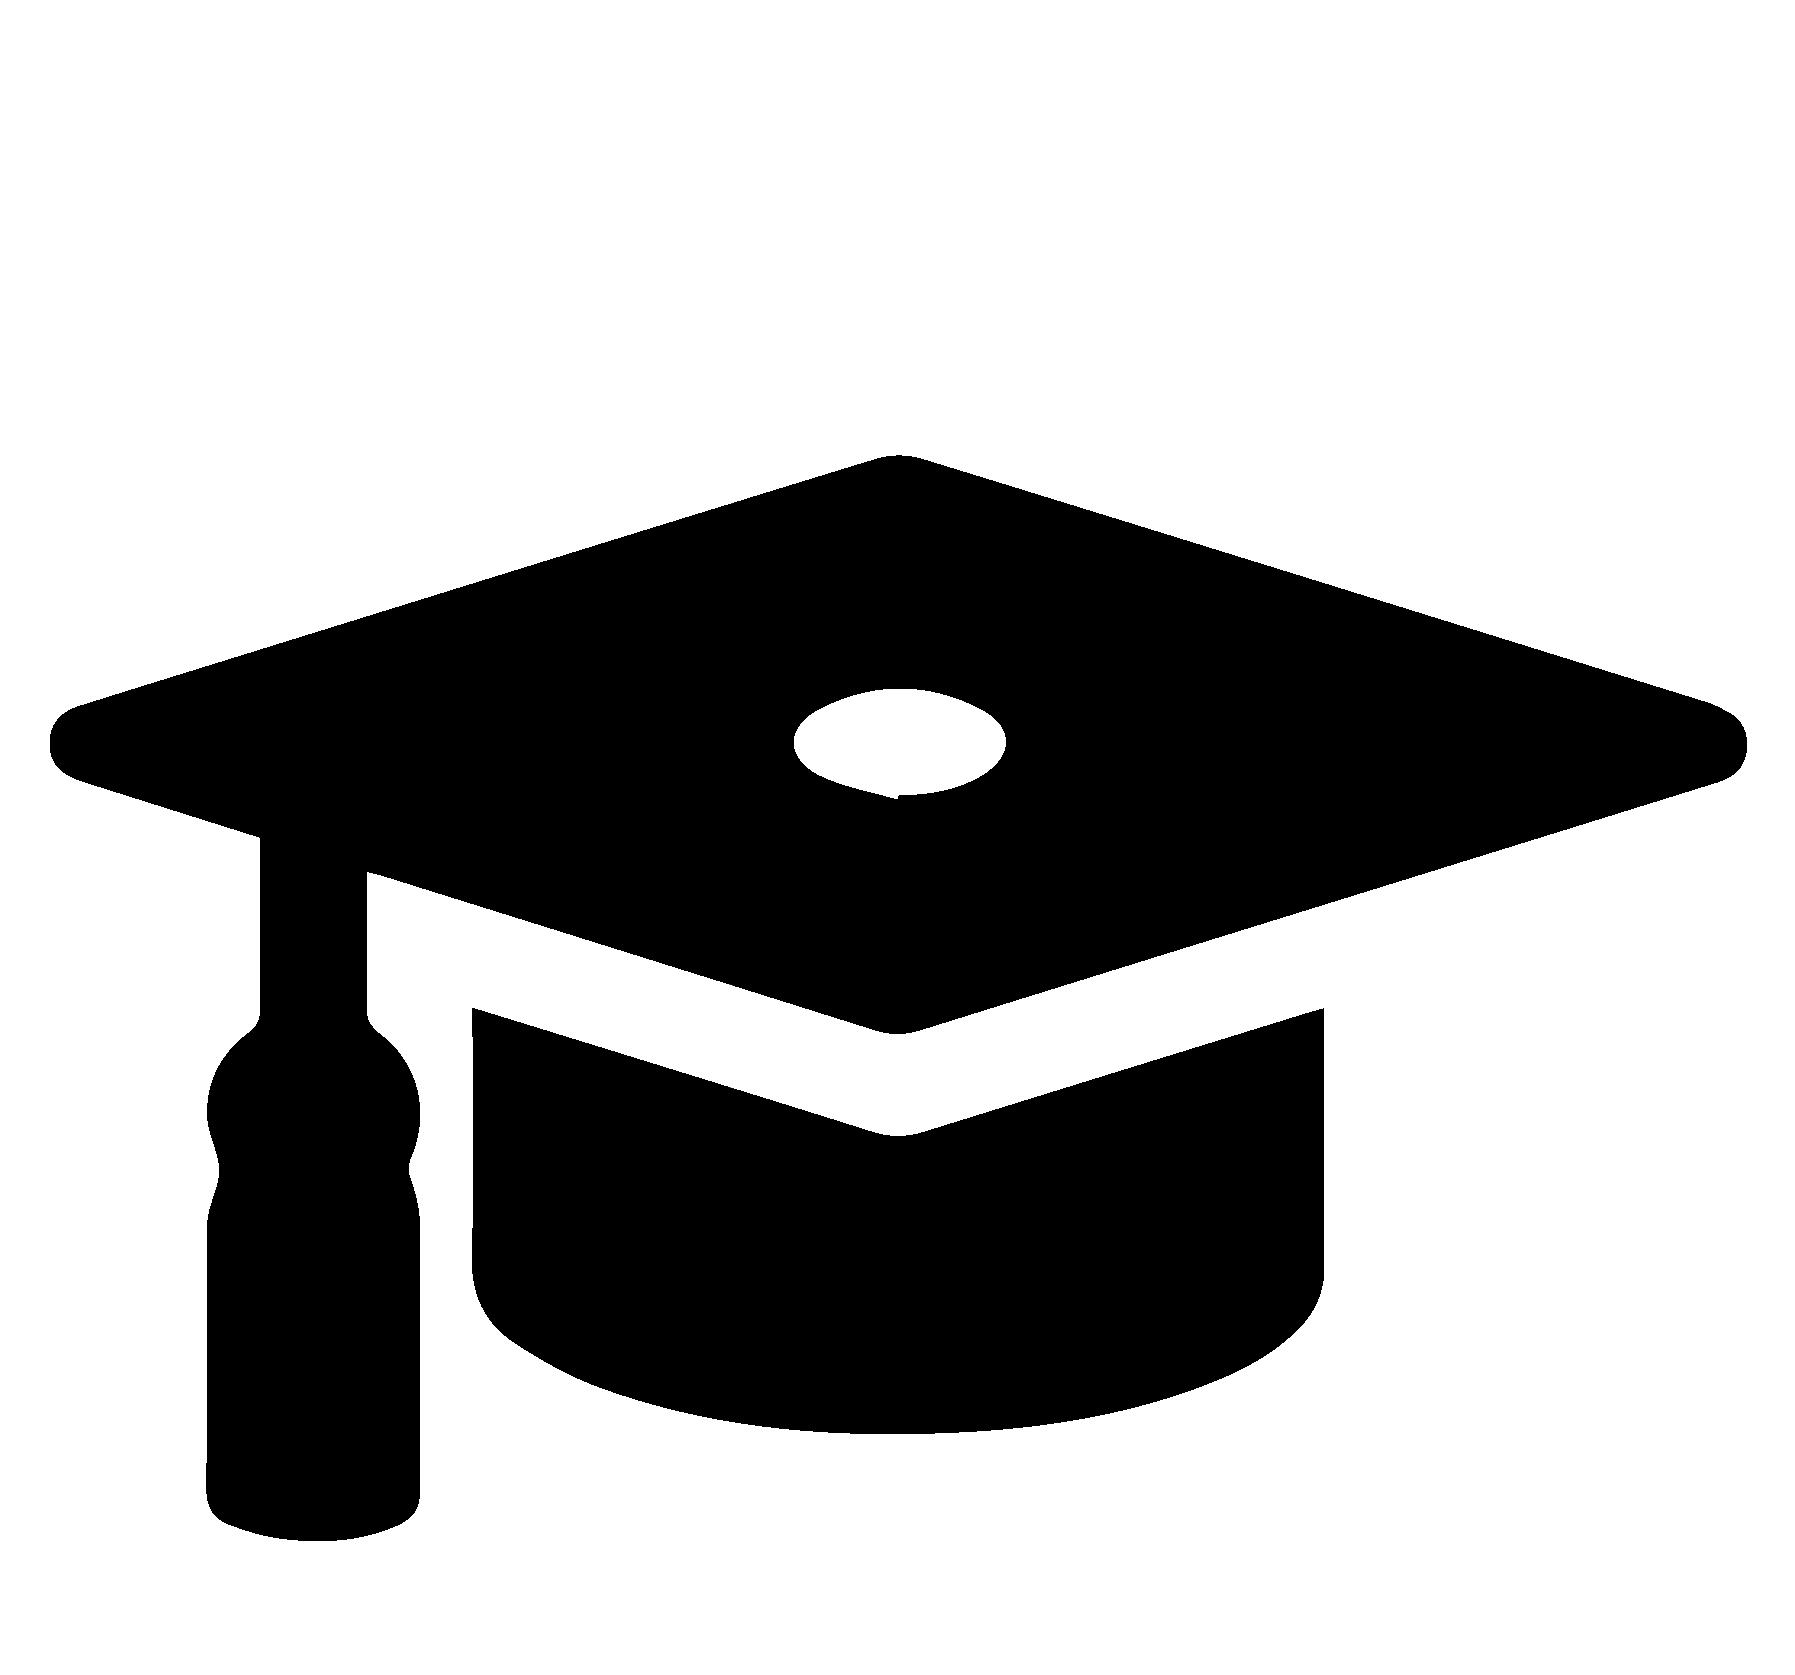 Academic Hat Transparent Images PNG SVG Clip arts